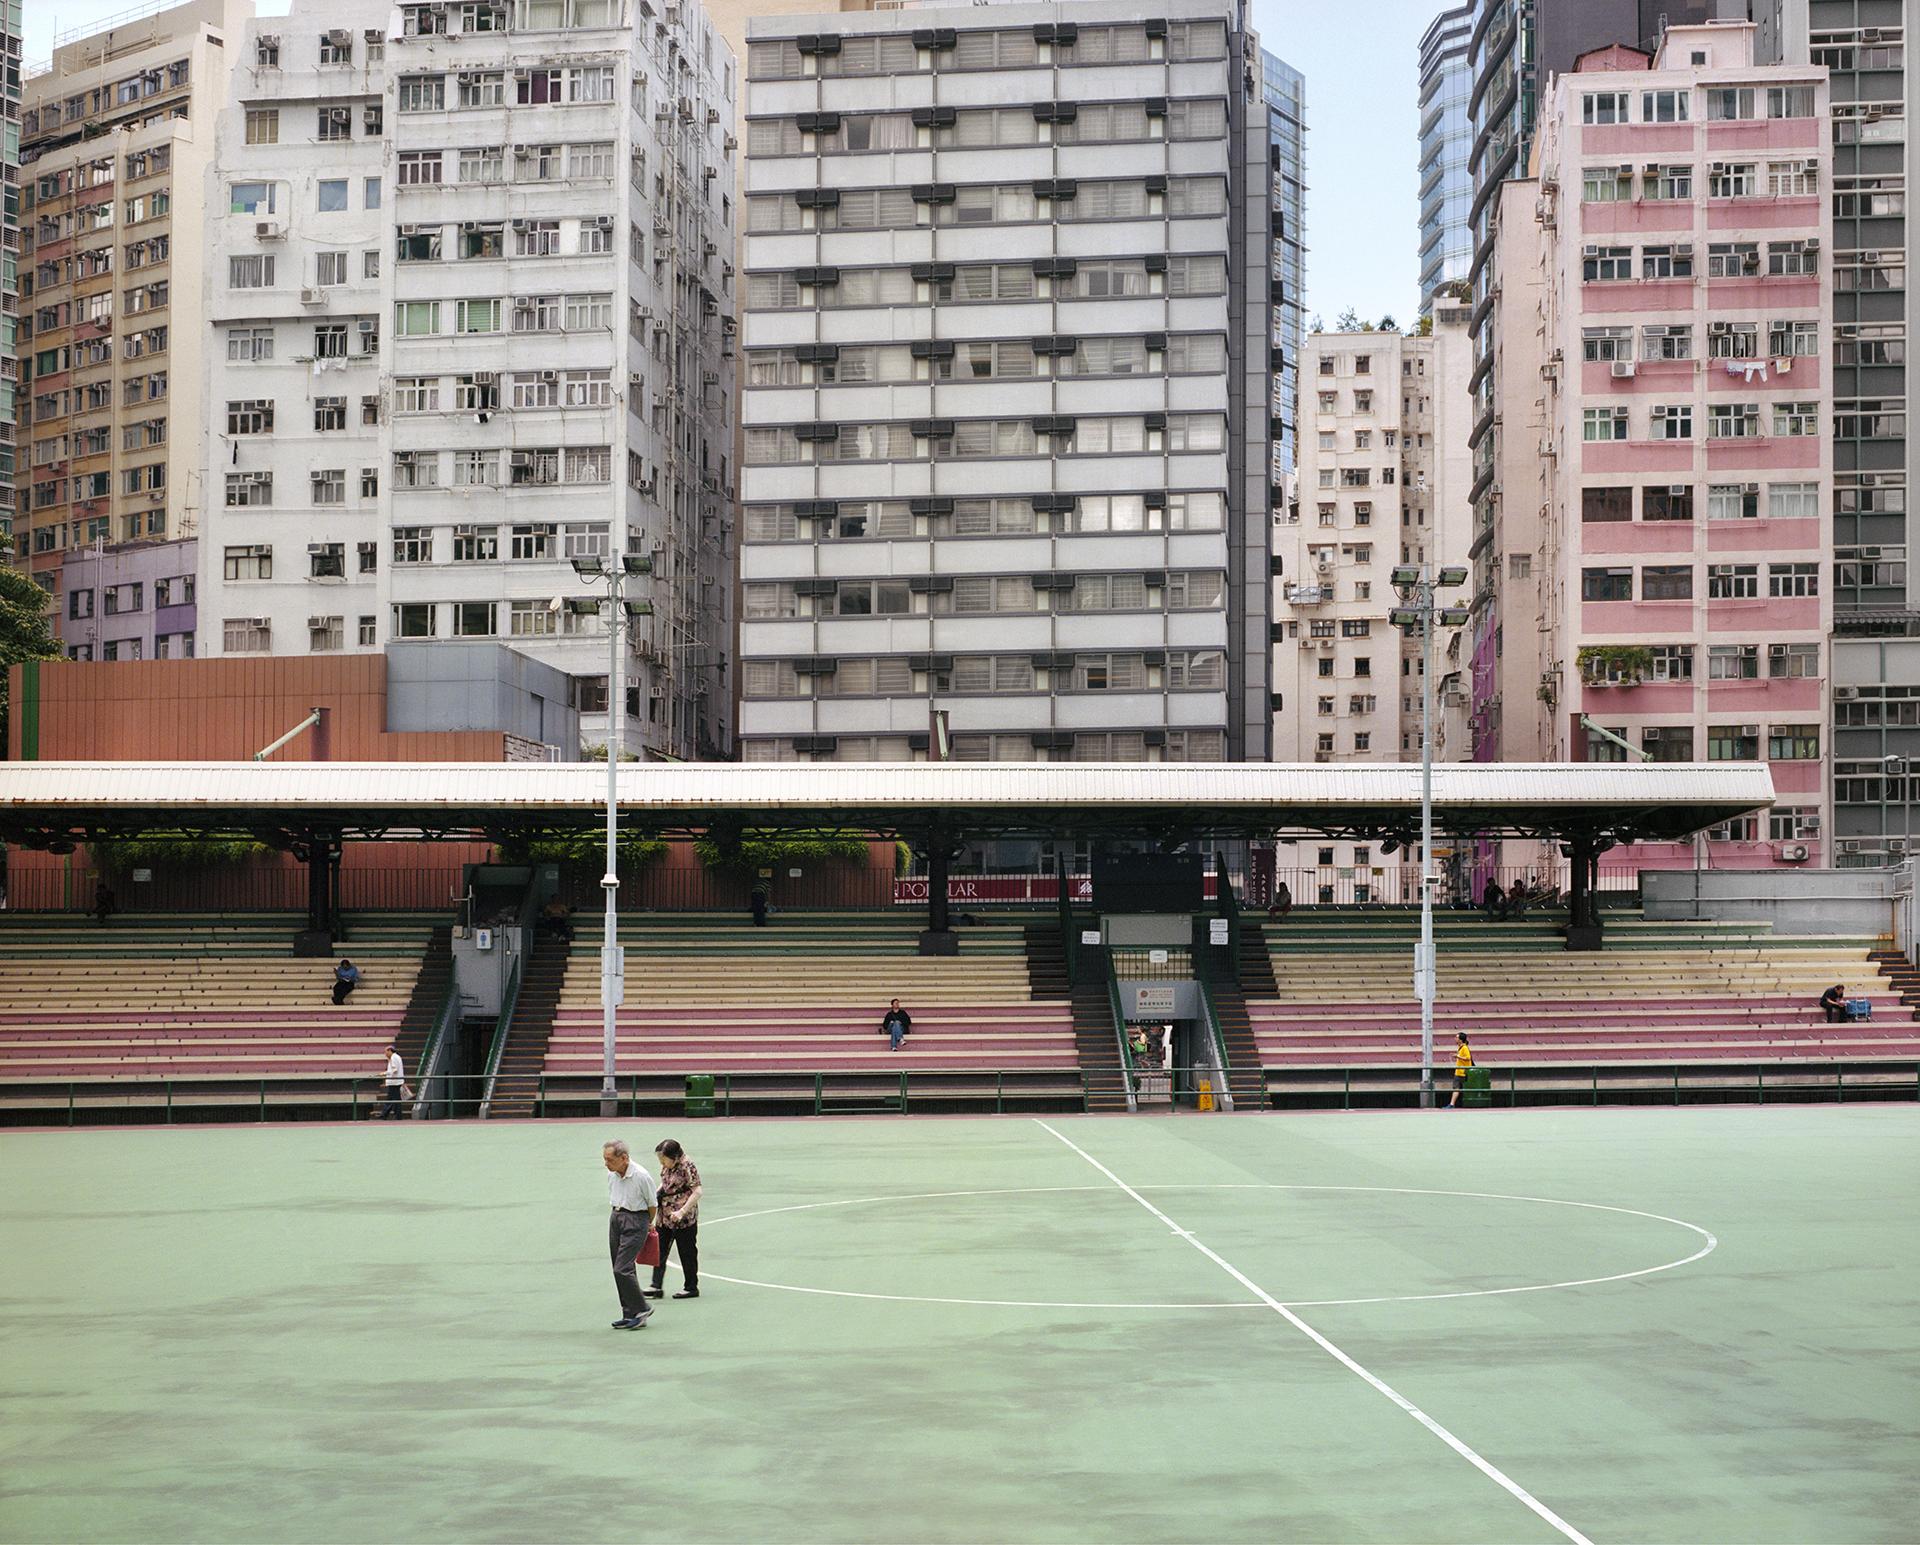 Wan chai sports ground, Hong Kong 2012